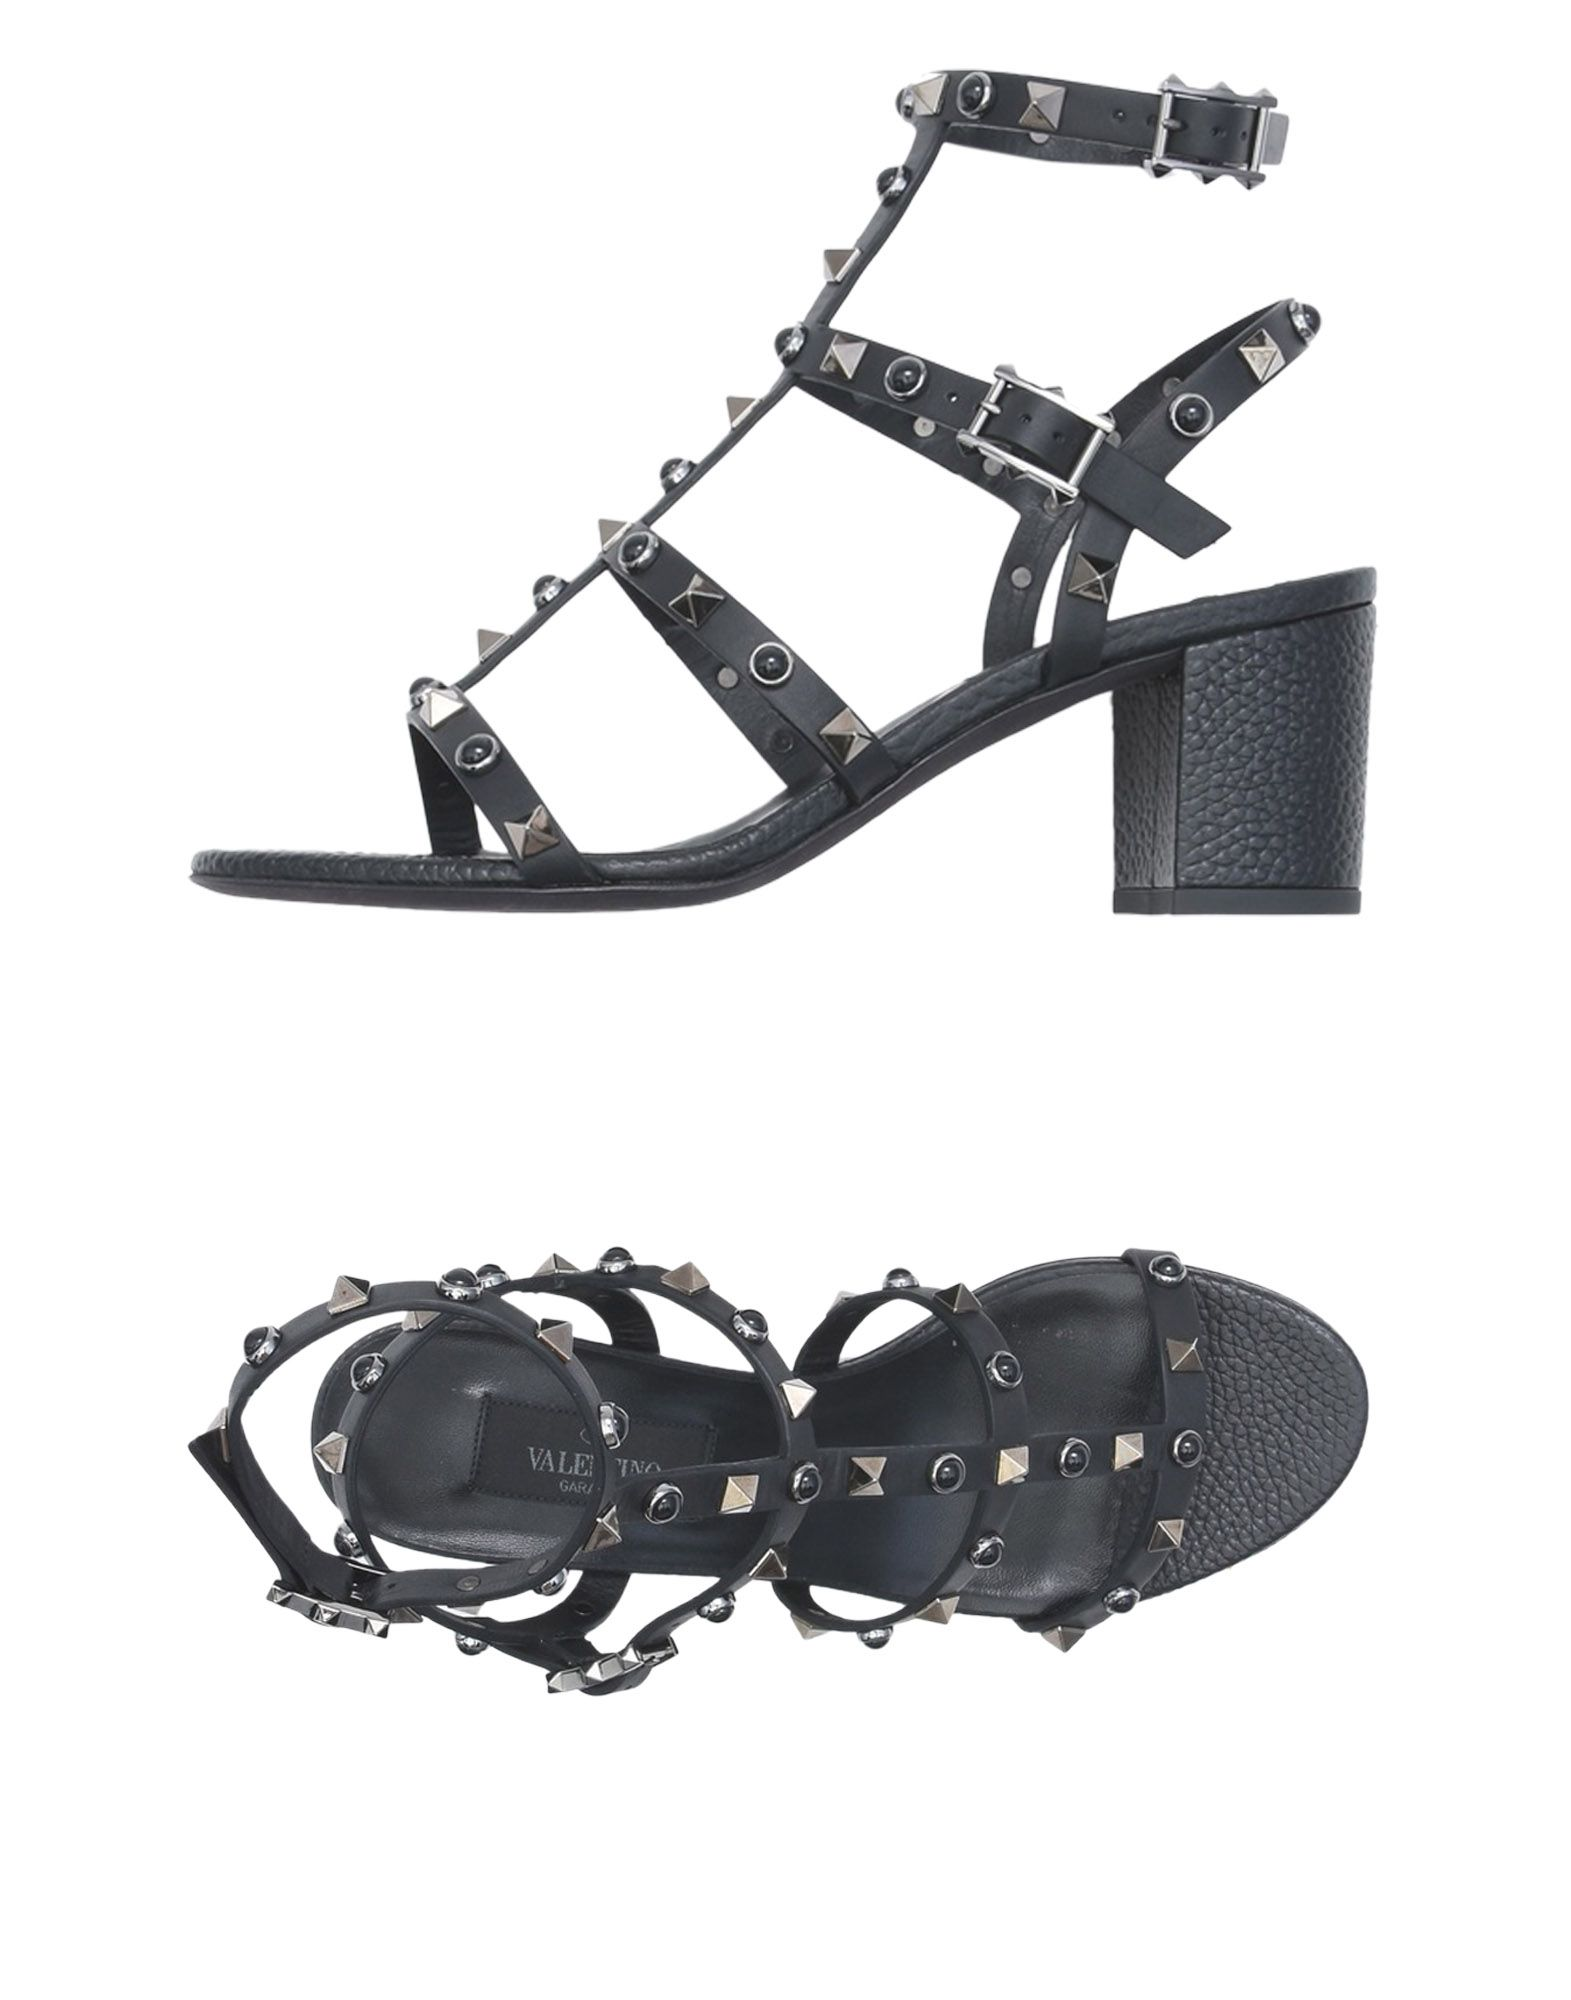 Valentino Garavani Sandals - Women on Valentino Garavani Sandals online on Women  Australia - 11486380FM 5e5723